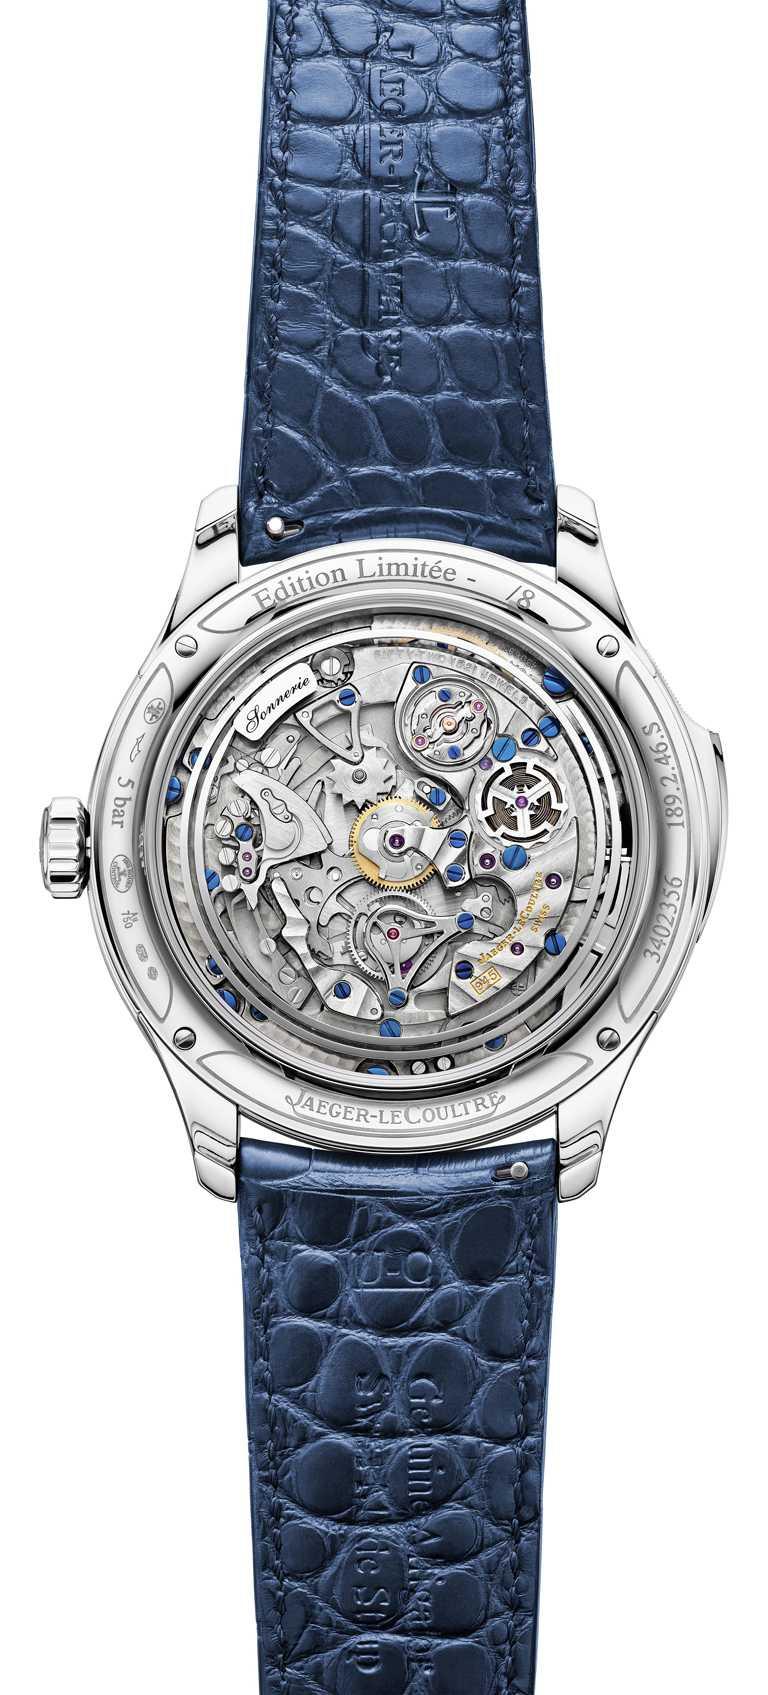 JAEGER-LECOULTRE「Master Grande Tradition超卓傳統大師系列」腕錶╱白金錶殼,45mm,鑽石44顆,限量8只╱14,500,000元。(圖╱JAEGER-LECOULTRE提供)